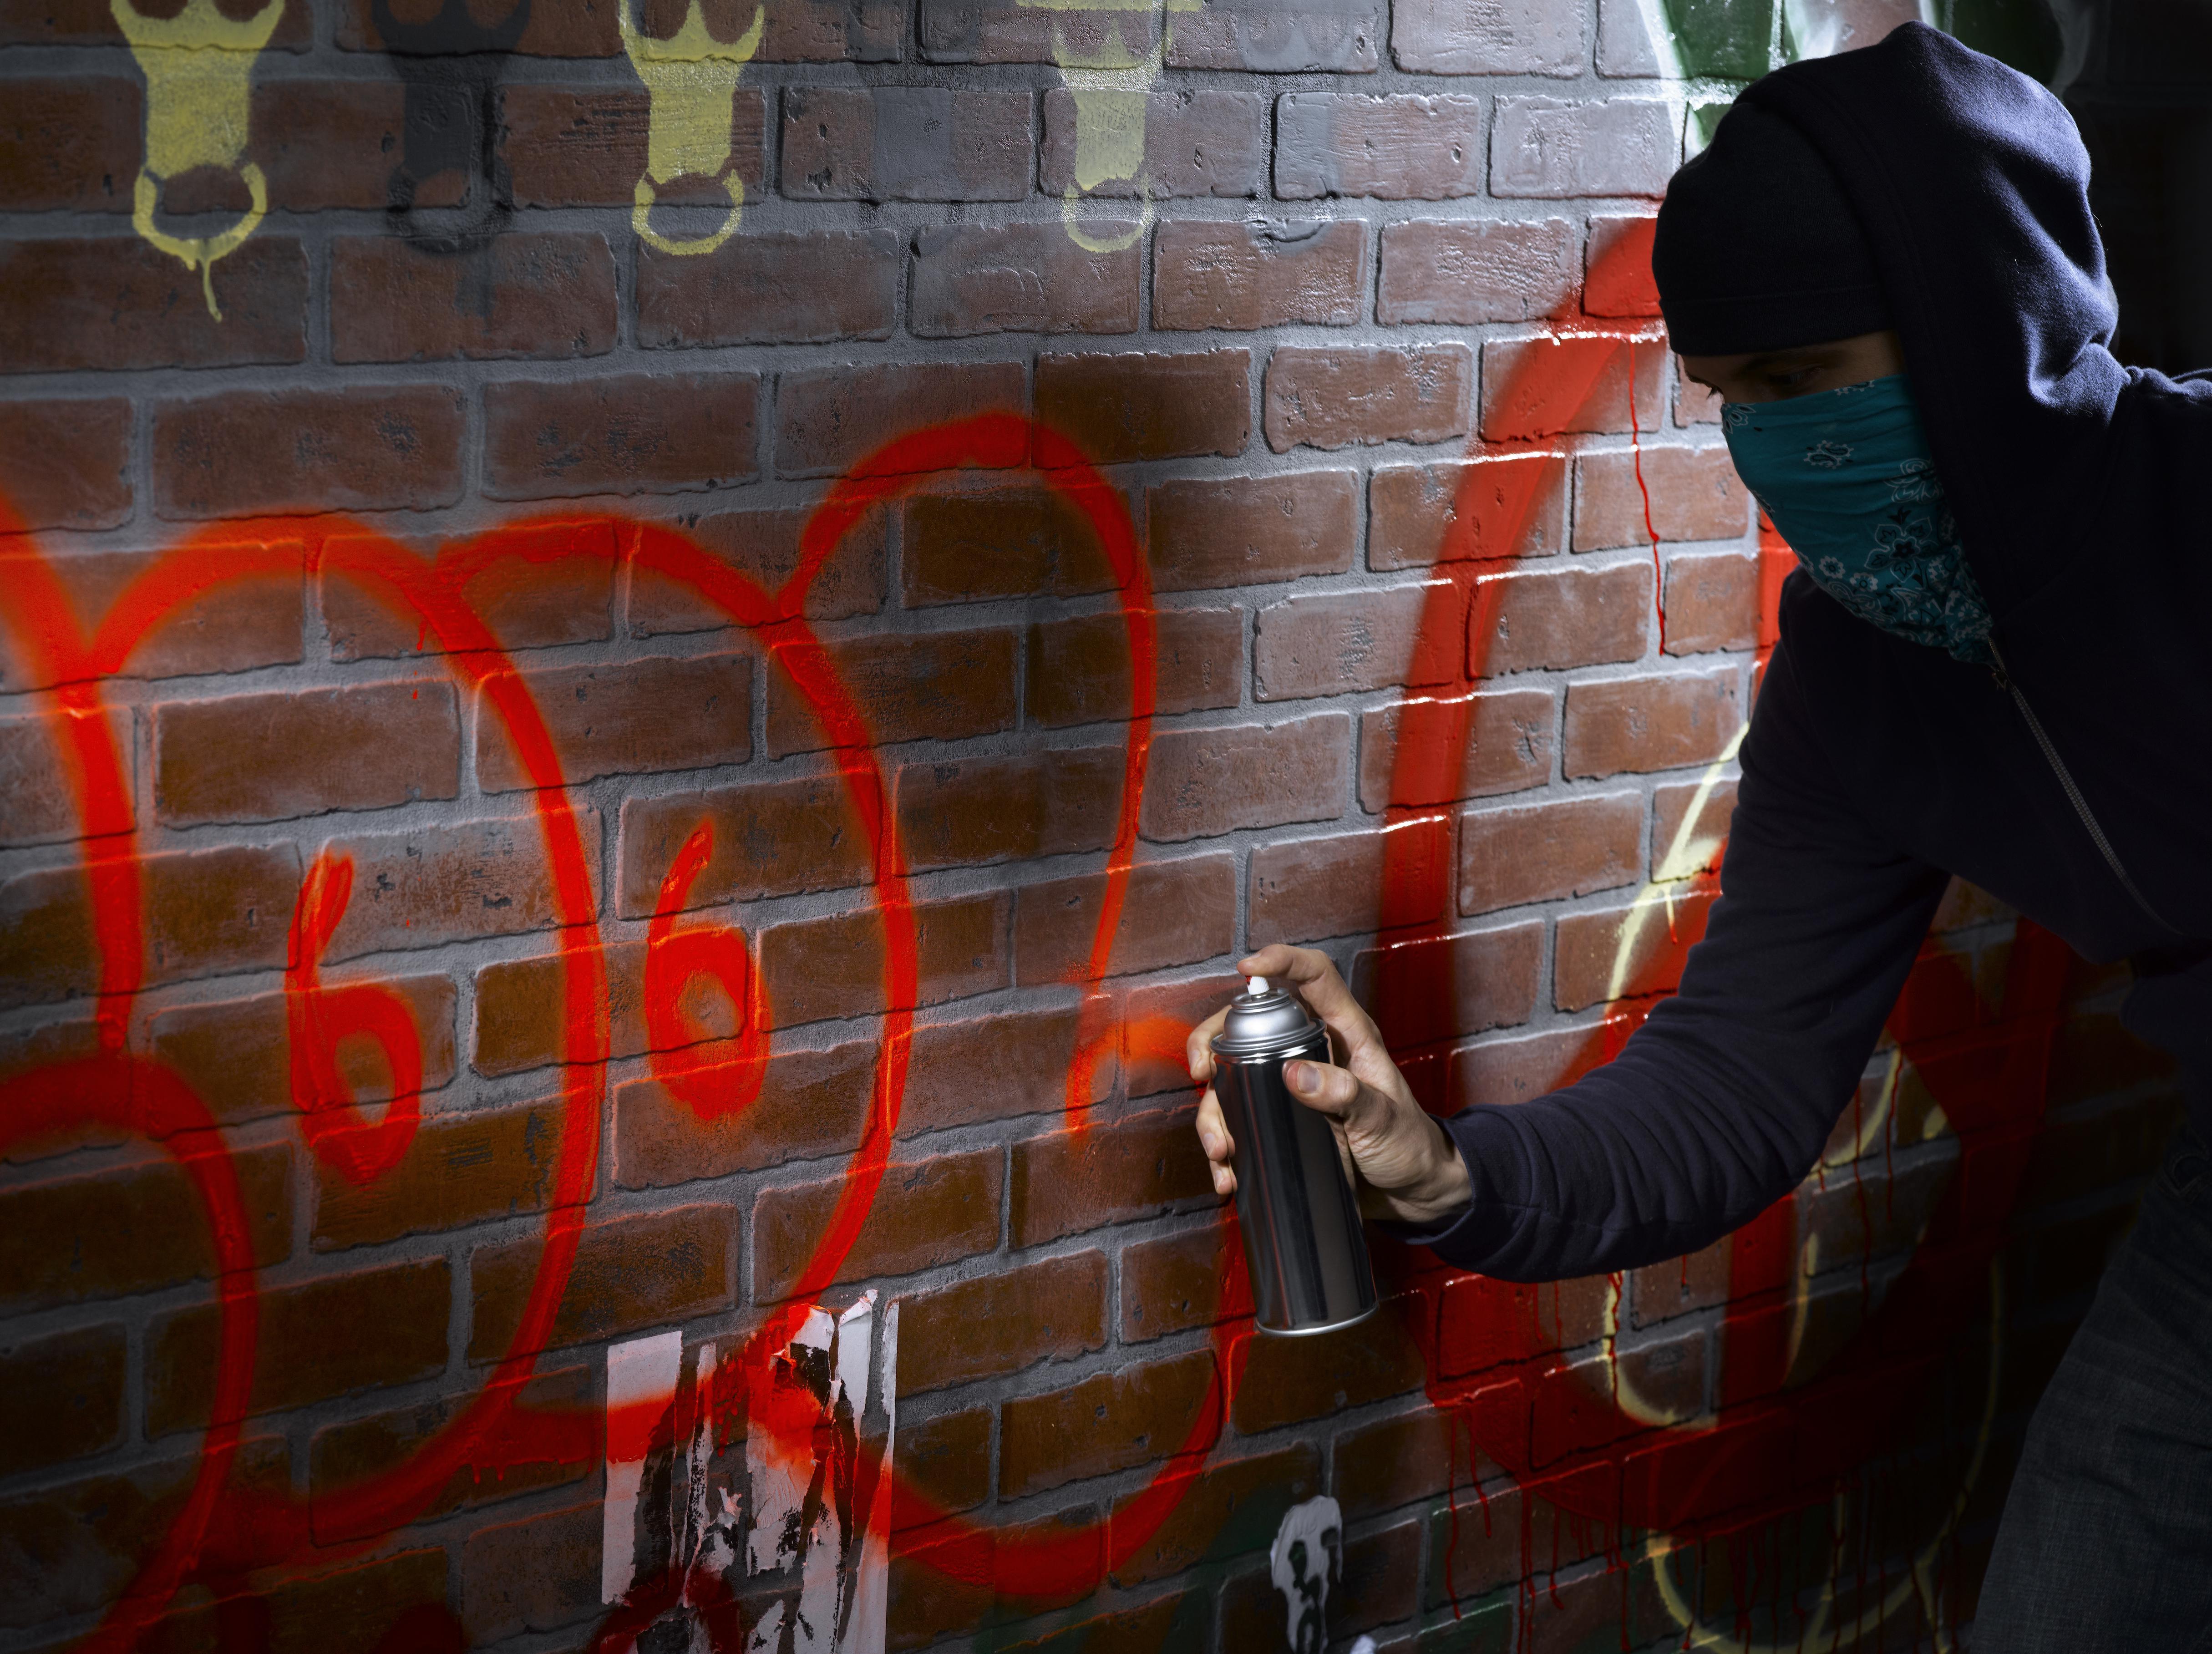 graffiti artist painting